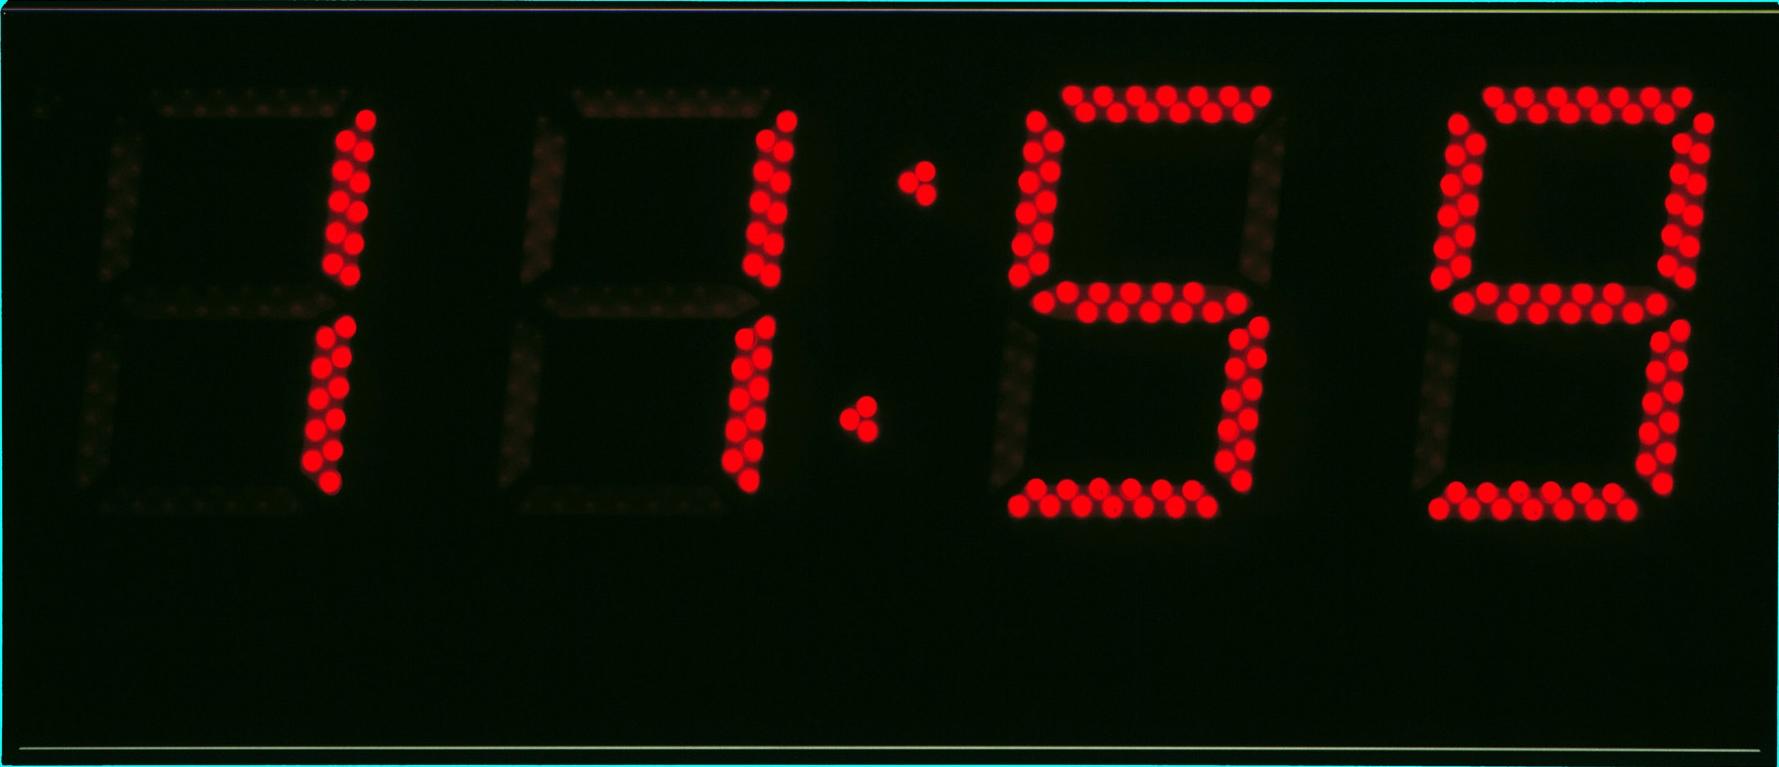 Stand Alone Digital Clock Led Clocks Digital Display